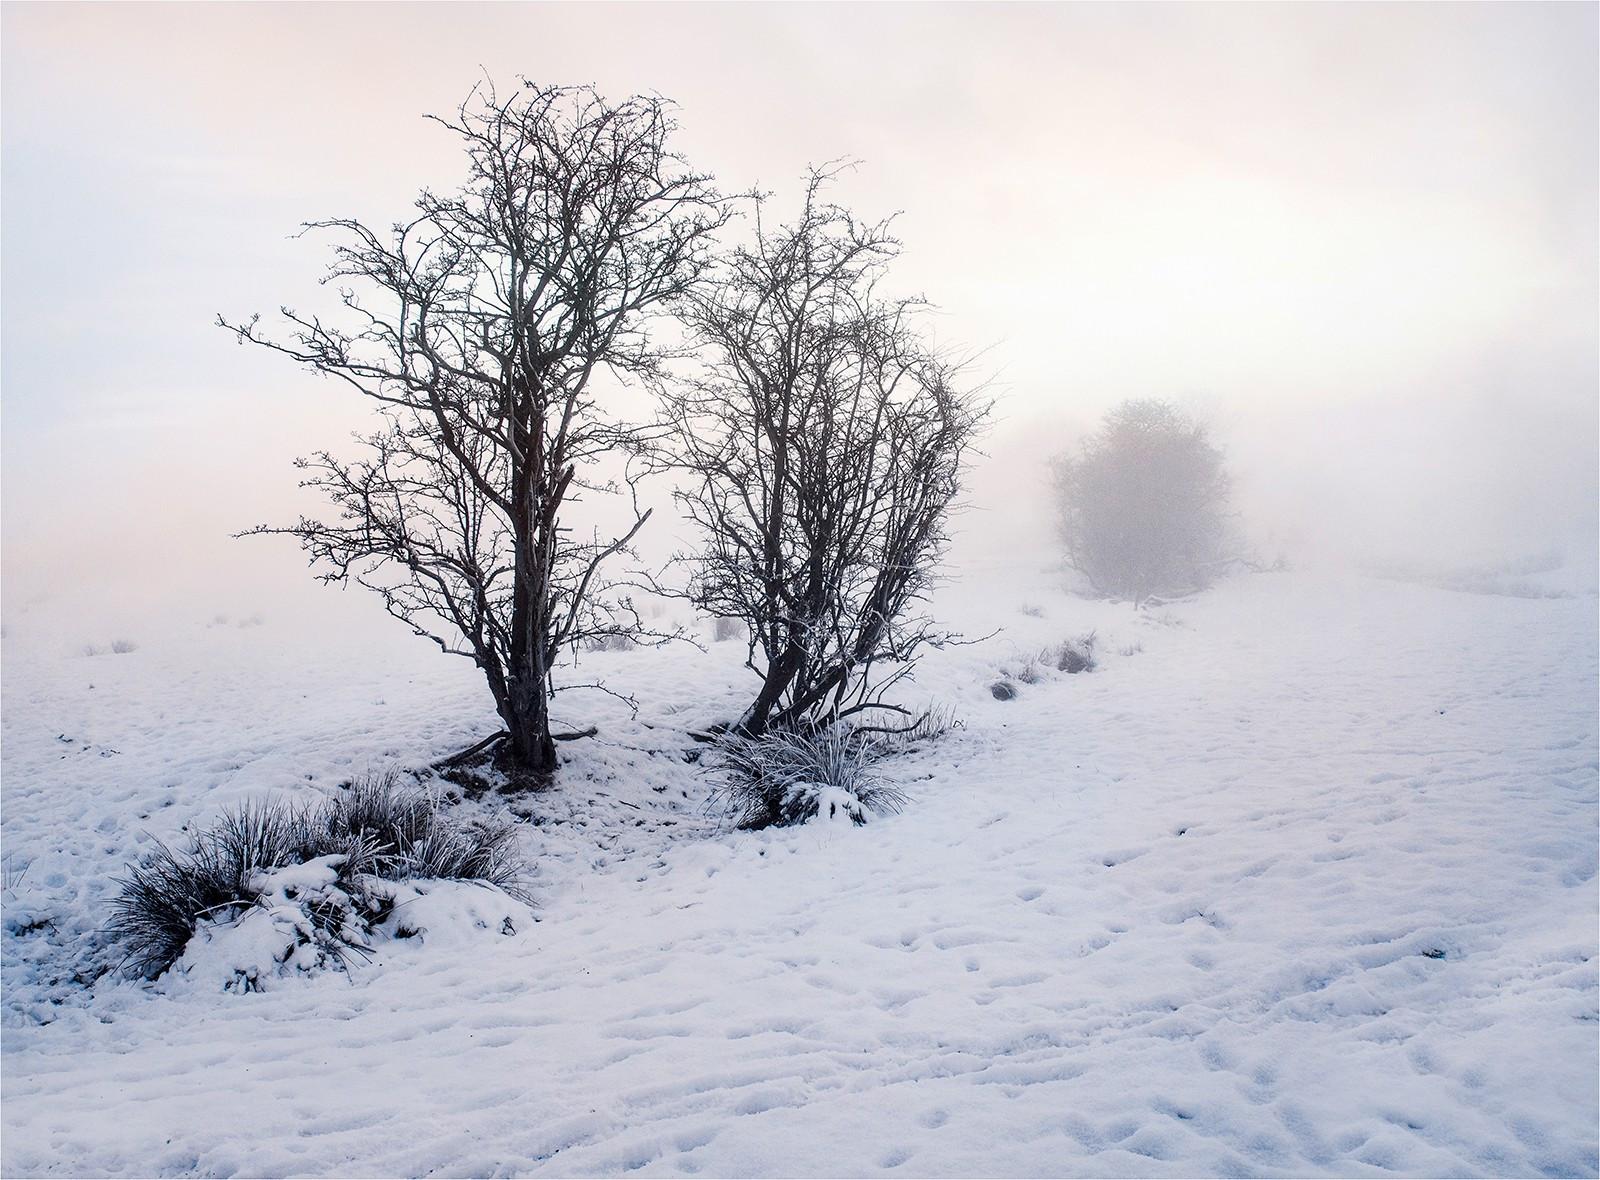 Mist snow cold  Atmosphere.